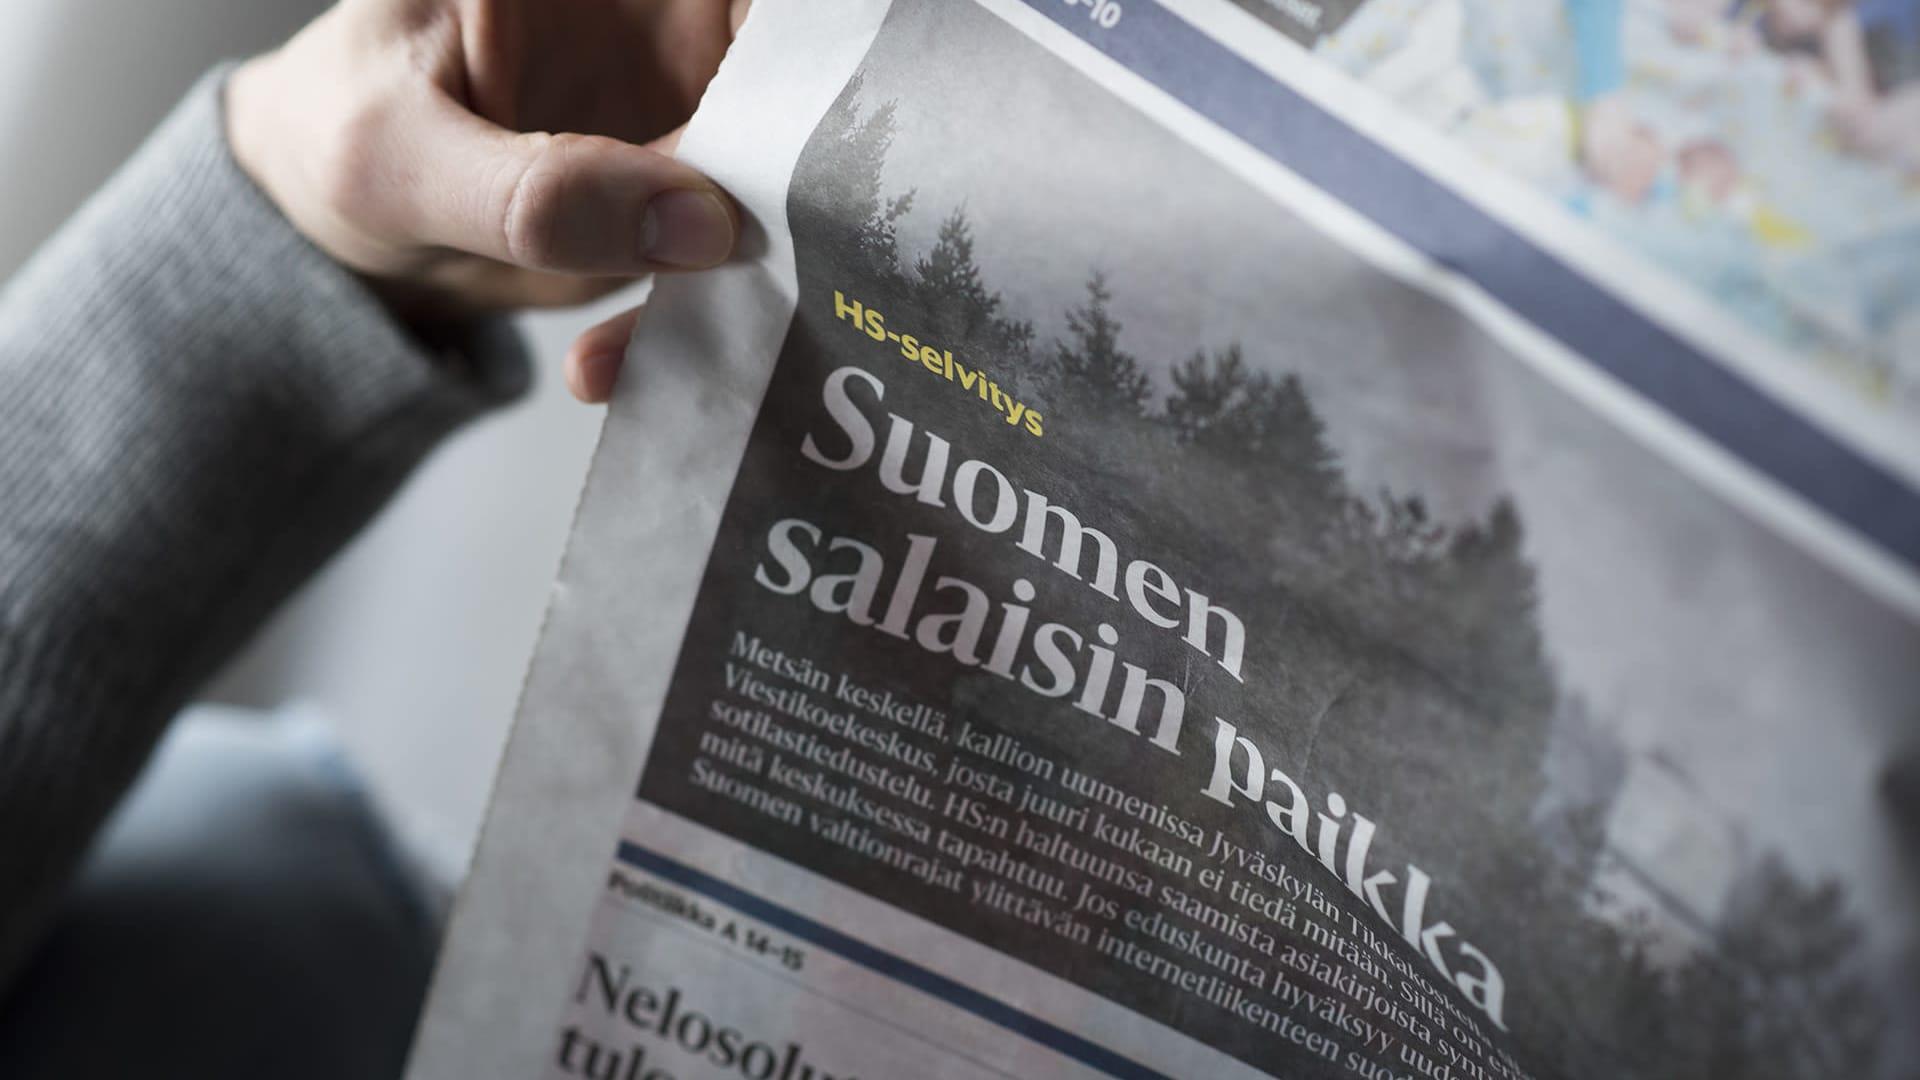 Mies lukee Helsingin Sanomia